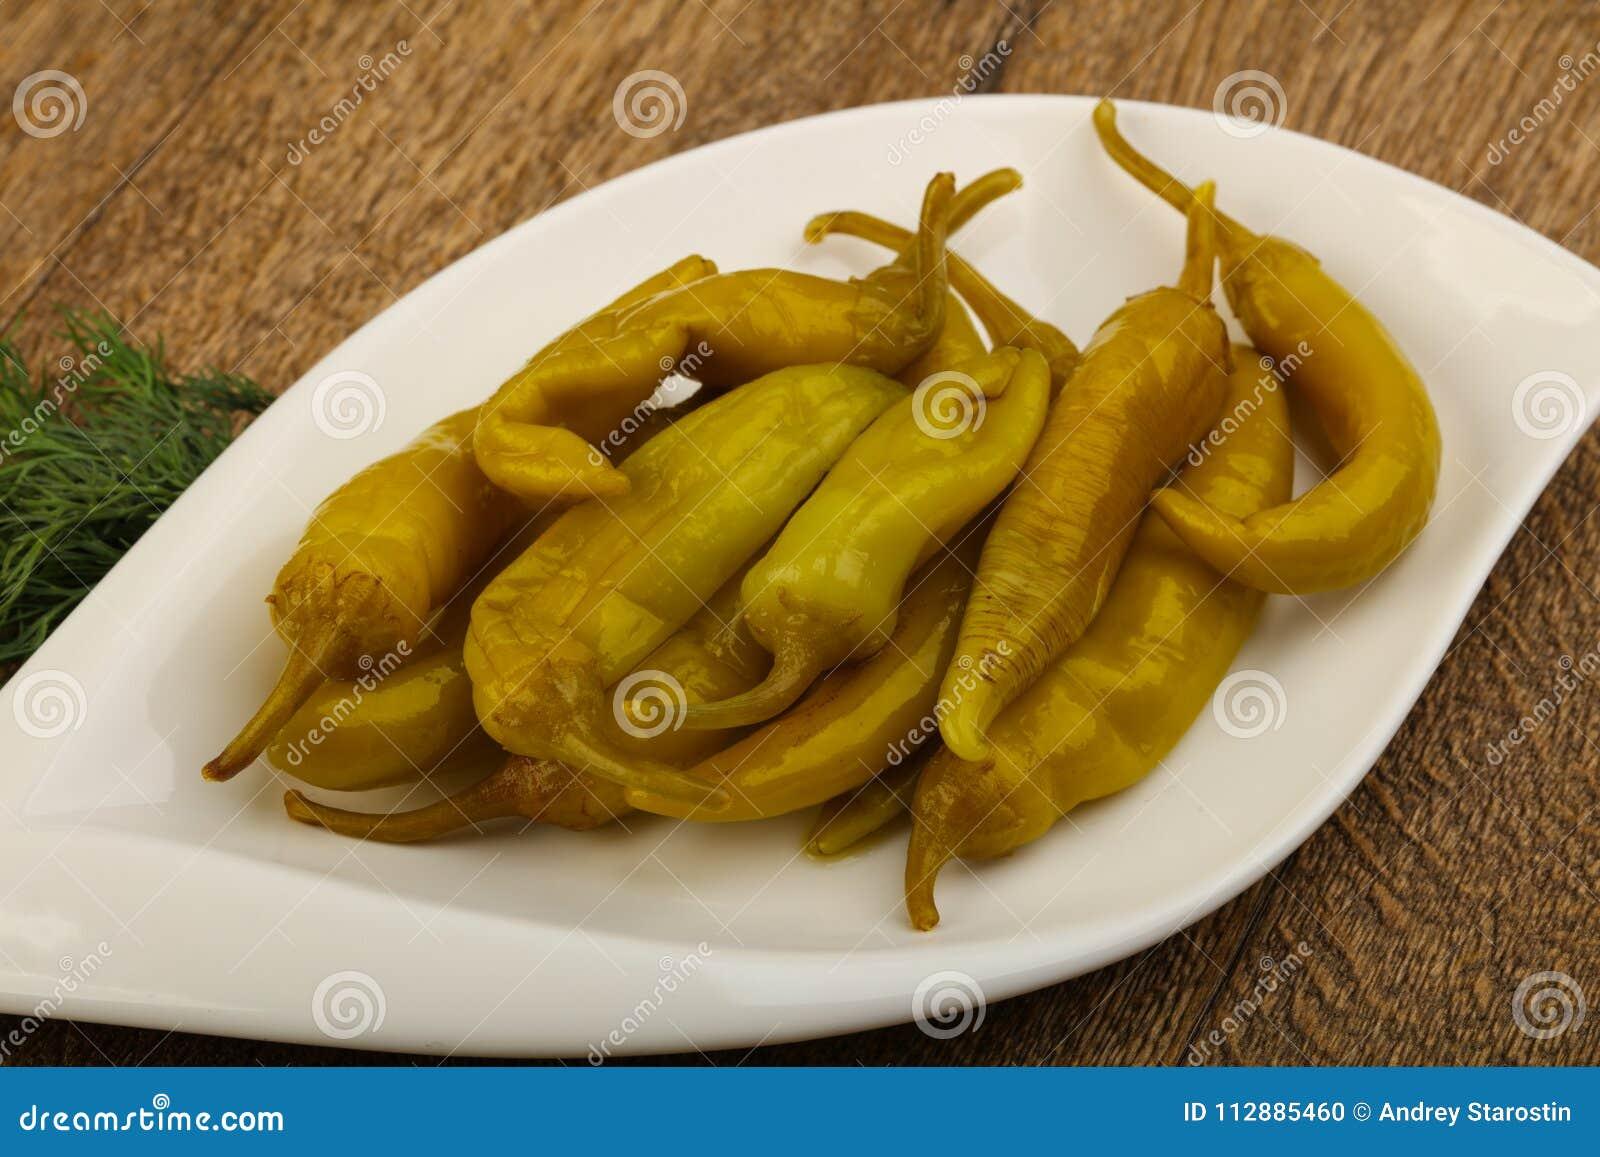 Pickled pepperoni pepper